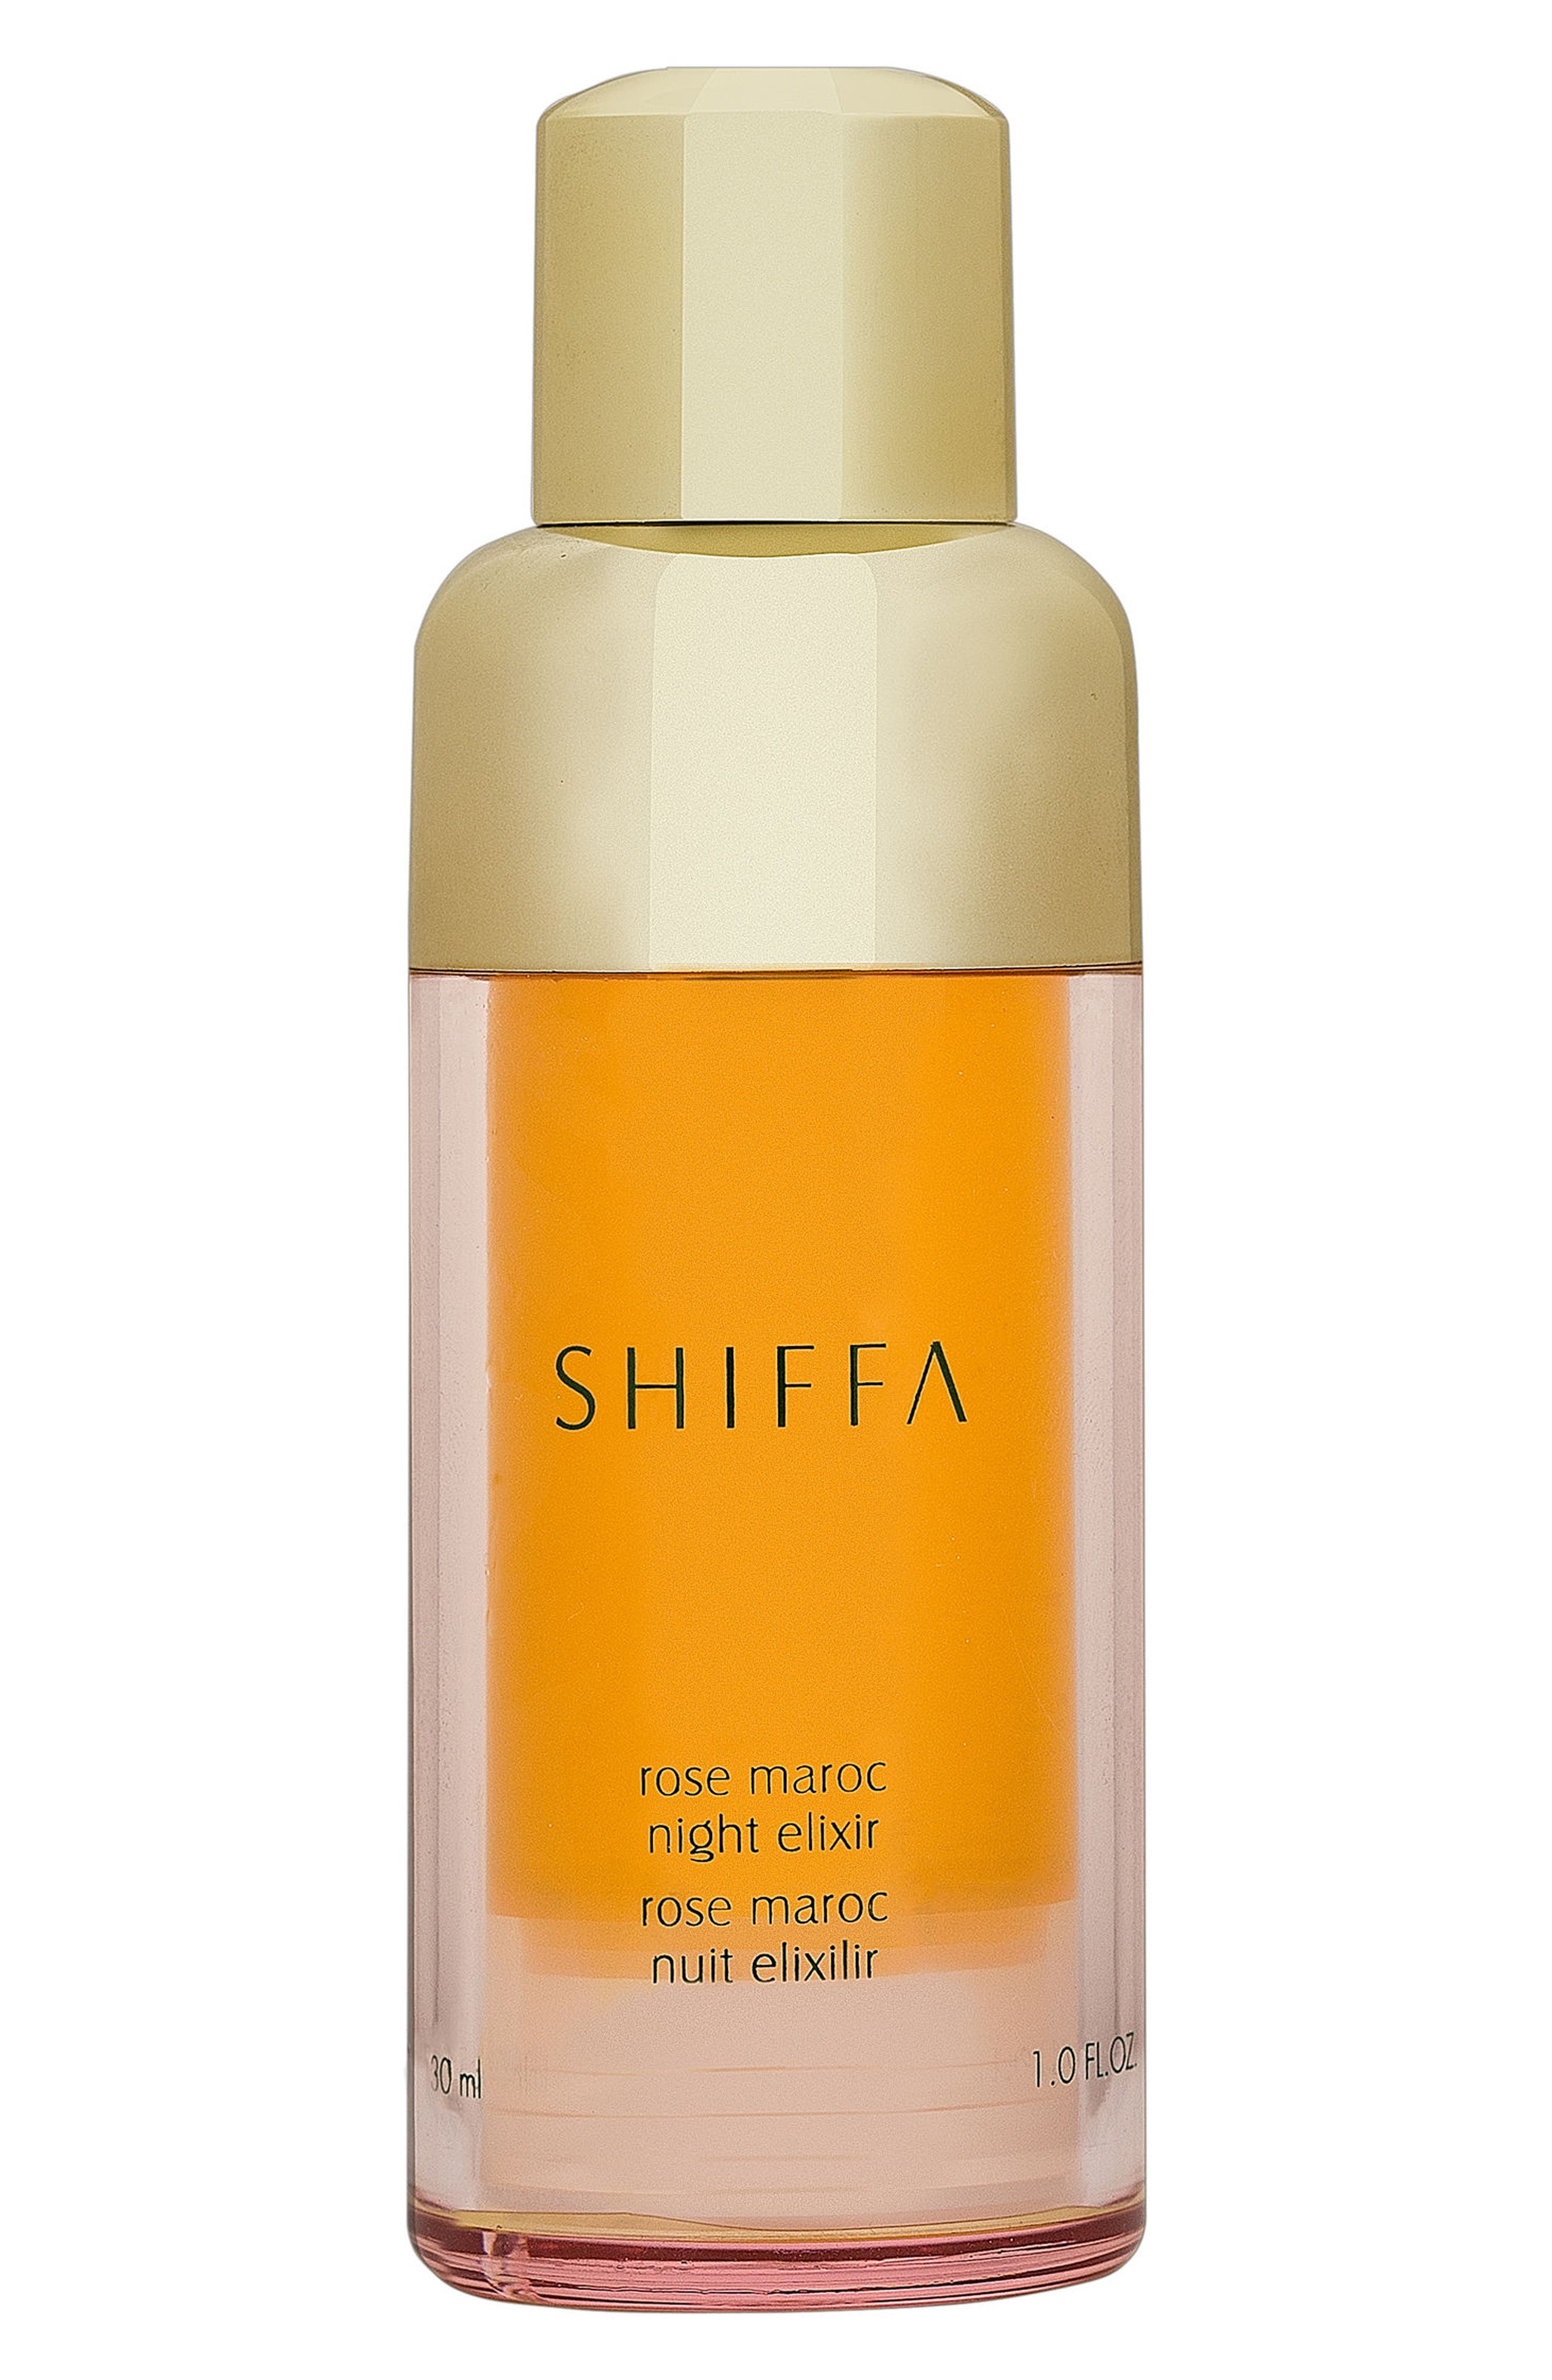 Shiffa Rose Maroc Night Elixir (Nordstrom Exclusive)